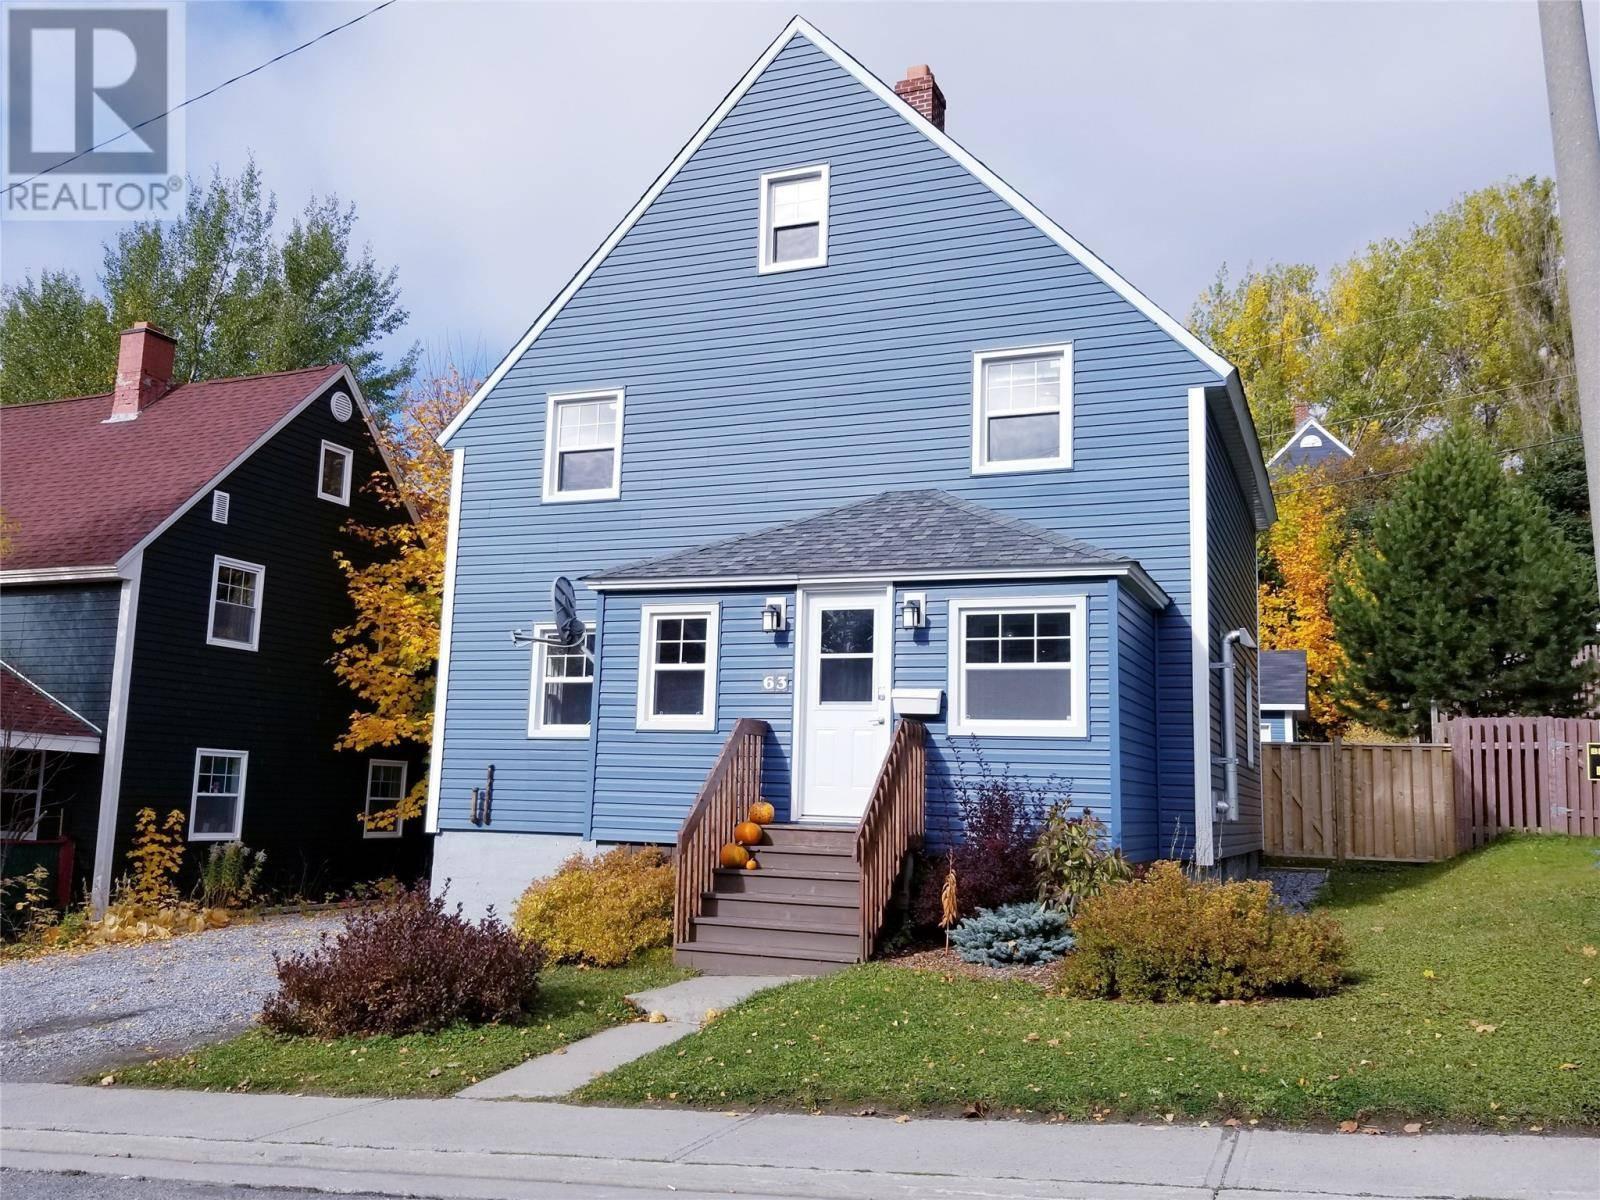 House for sale at 63 East Valley Rd Corner Brook Newfoundland - MLS: 1205418